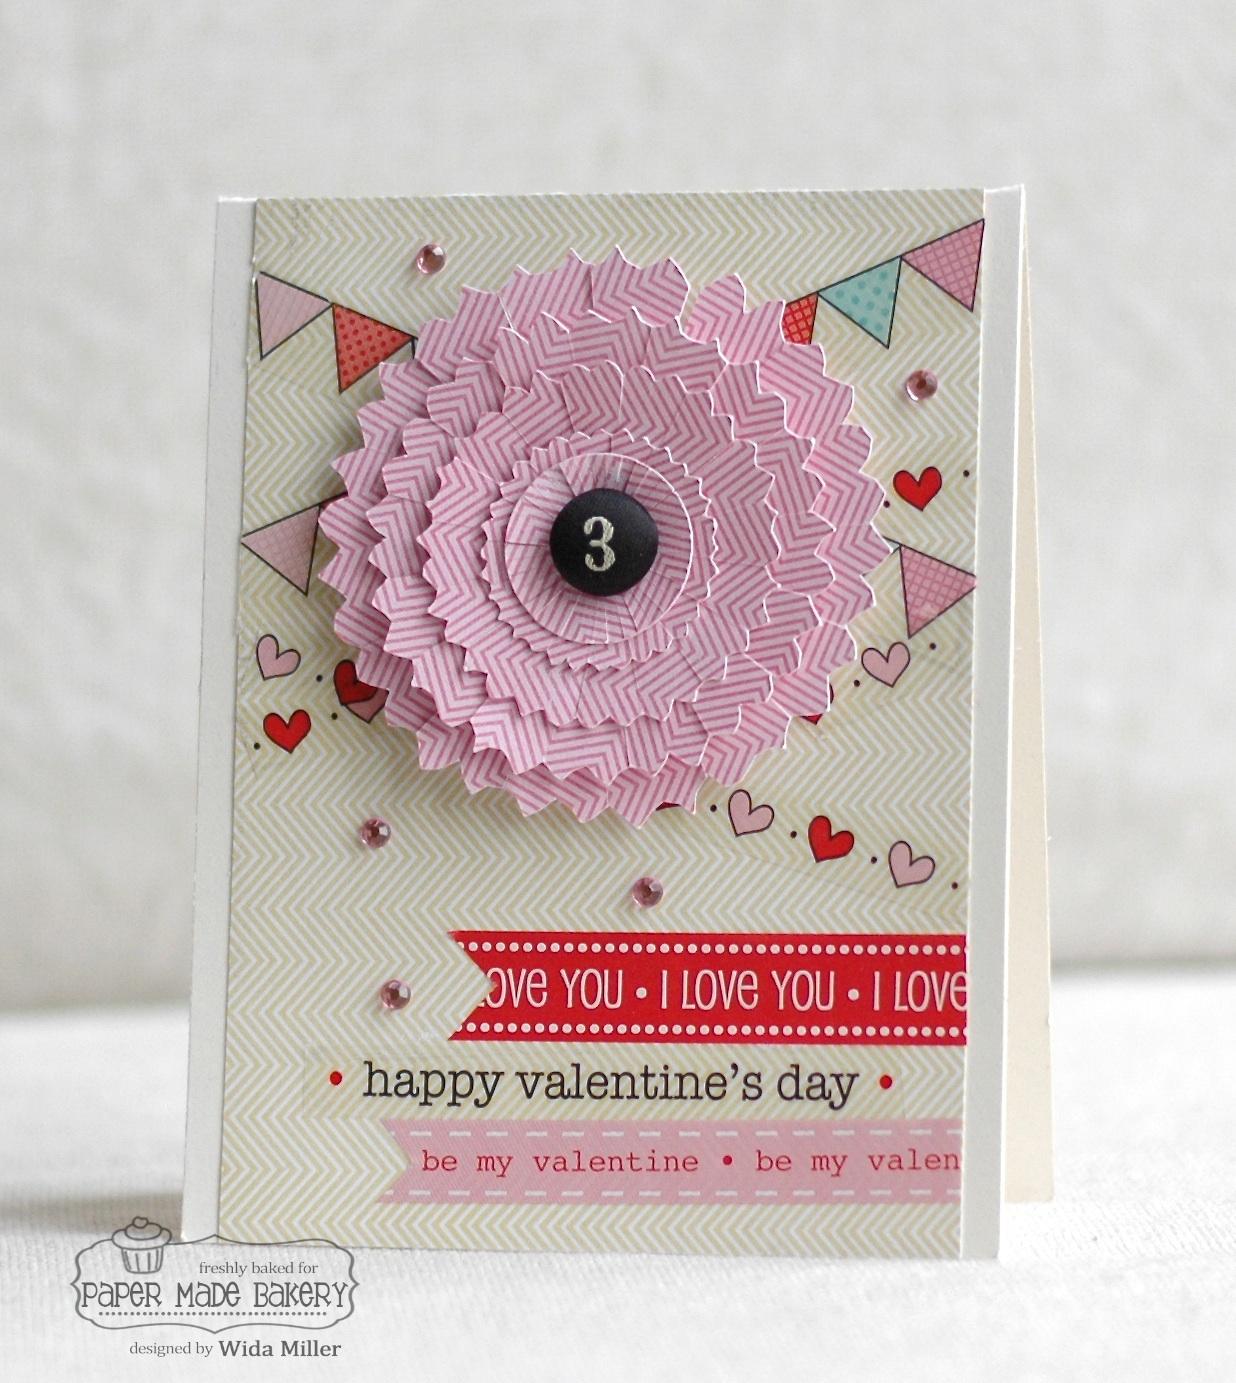 http://4.bp.blogspot.com/-Z9A1fifybpY/UPuBw5LKDtI/AAAAAAAAGwI/XMlUaxCJRrk/s1600/PMB+banner+love+you.jpg